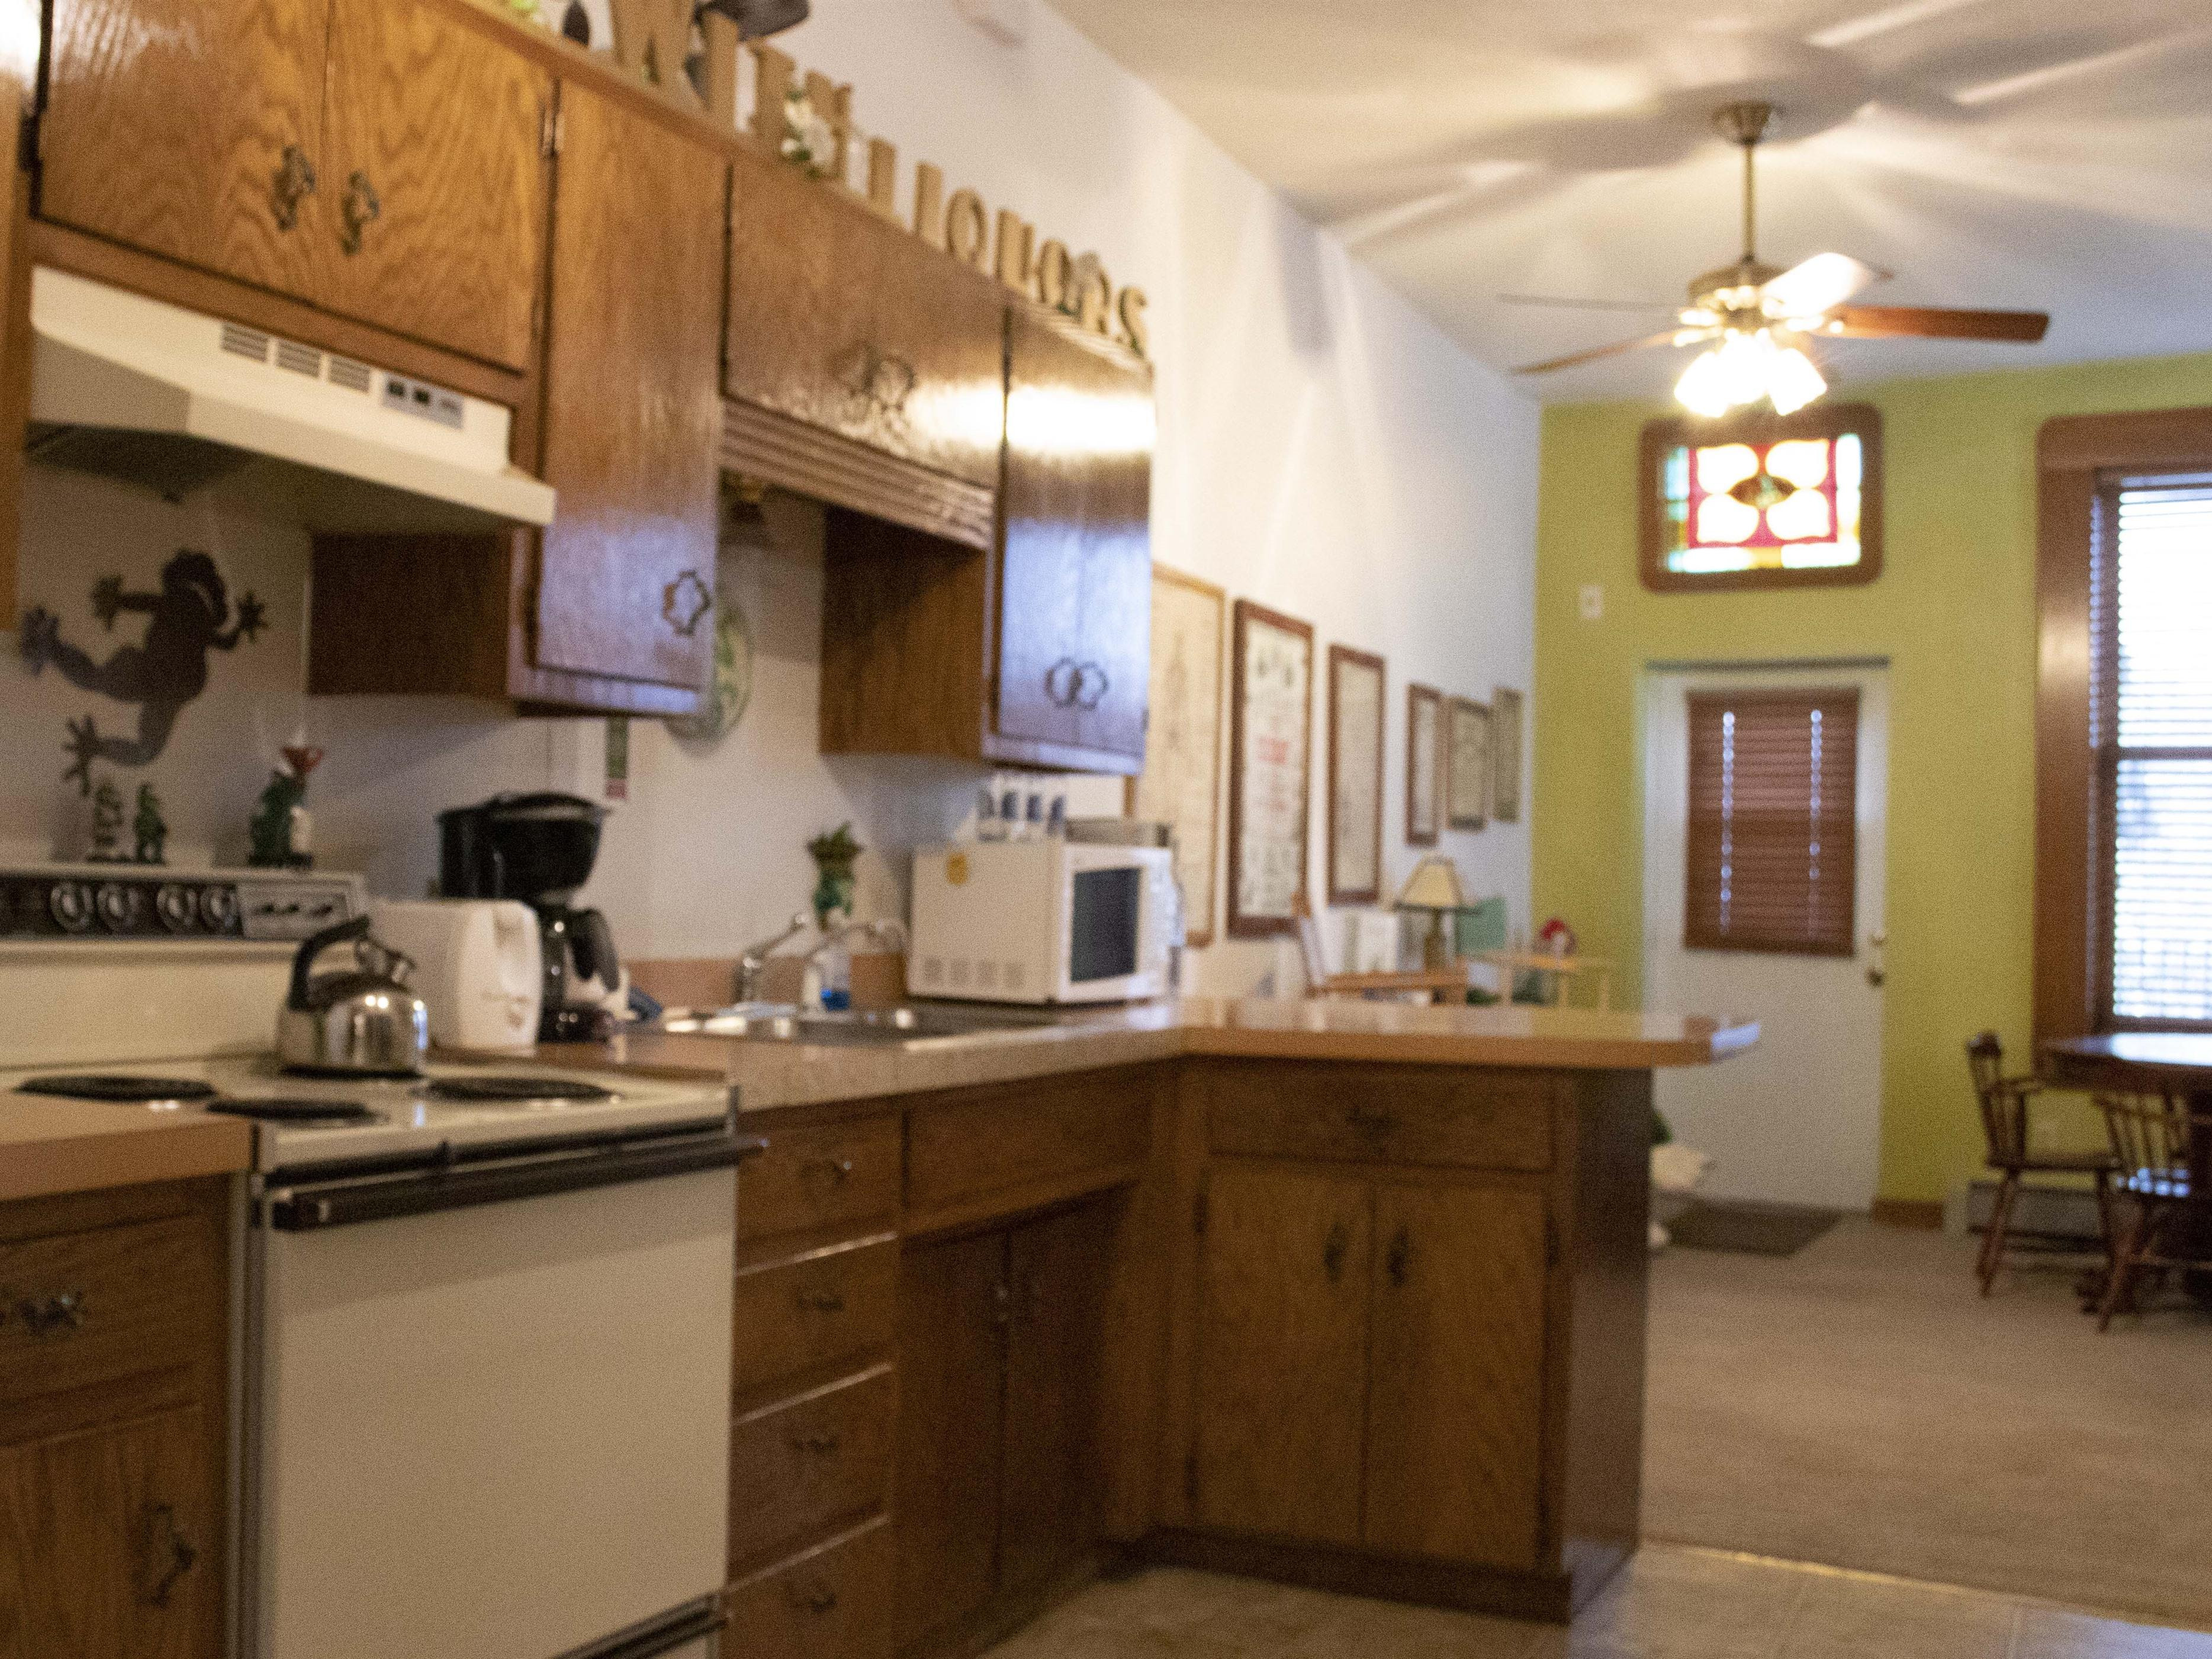 Apartment-Private Bathroom-Suite-River view-The Dr. Visty Suite #1